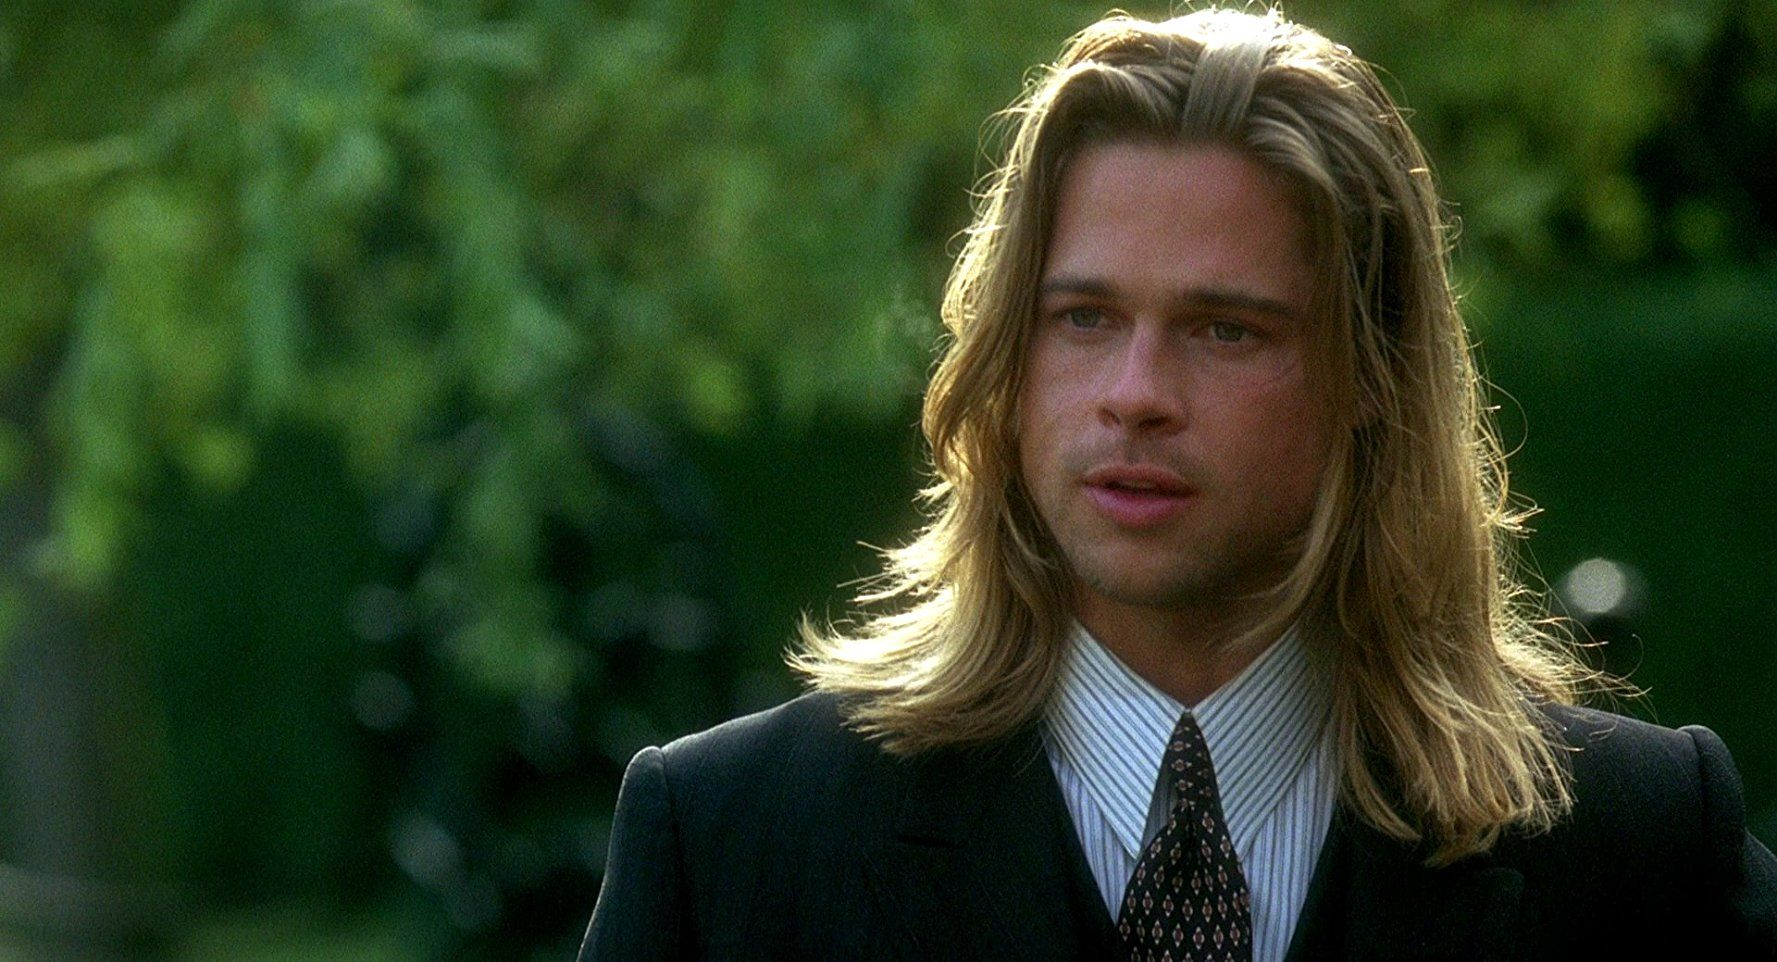 Legends Of The Fall 1994 Imdb Brad Pitt Brad Pitt Young Legends Of The Fall